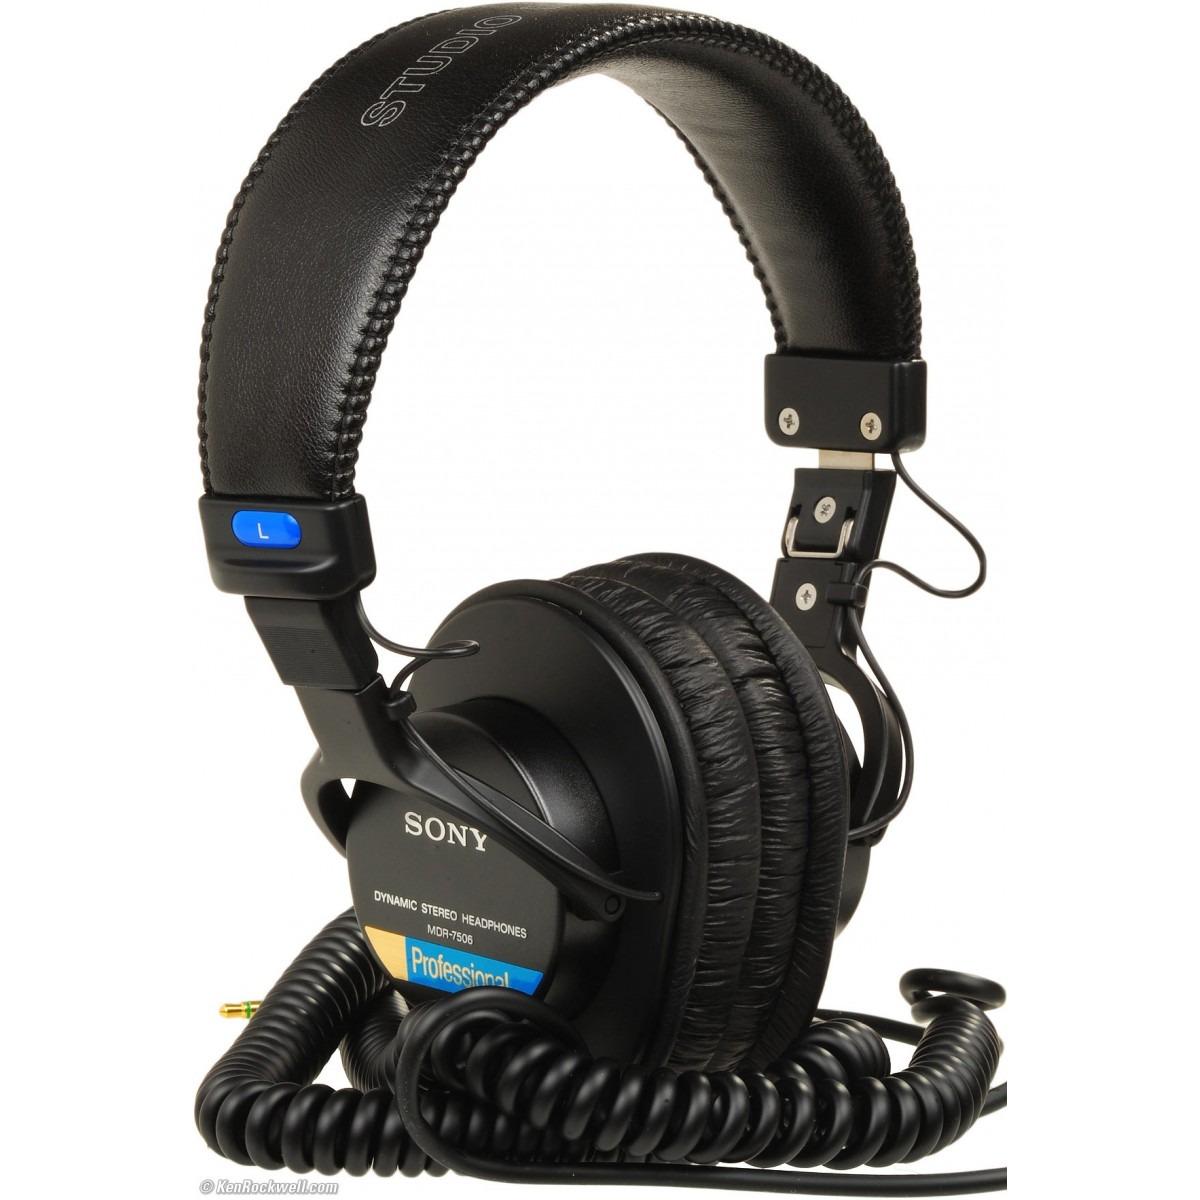 Headphone Sony Mdr-7506 Fone Profissional - R$ 478,98 em